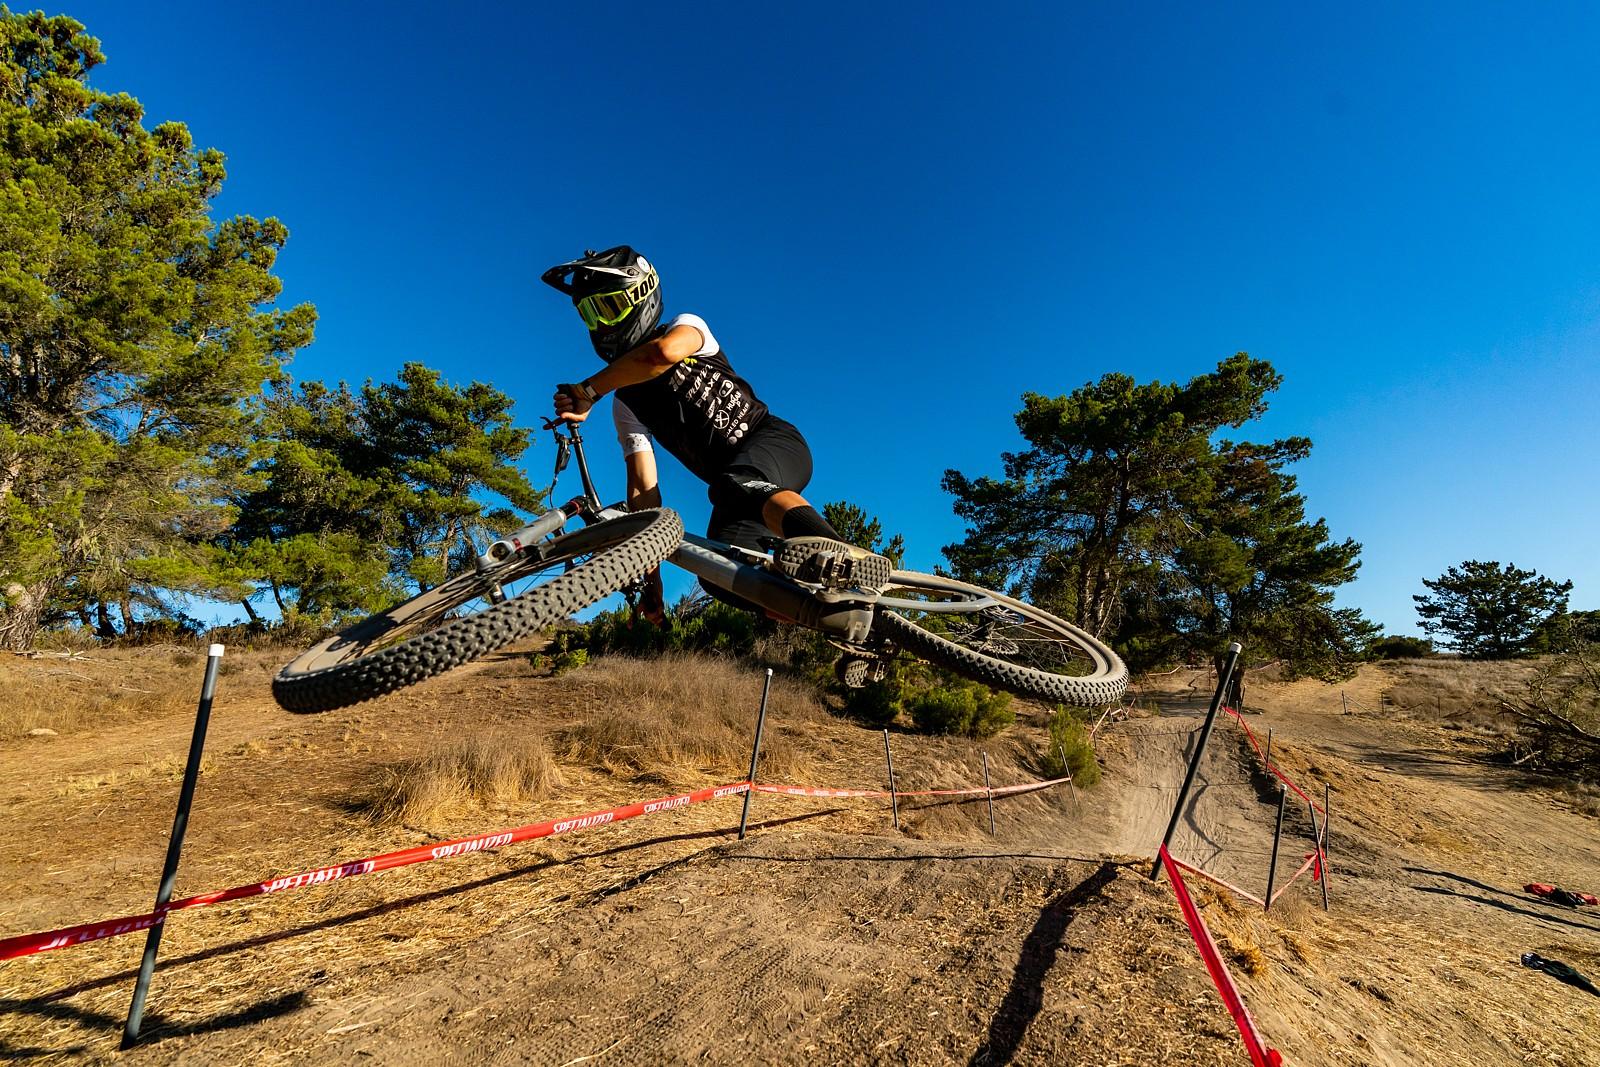 Nick Dinapoli - Zuestman - Mountain Biking Pictures - Vital MTB